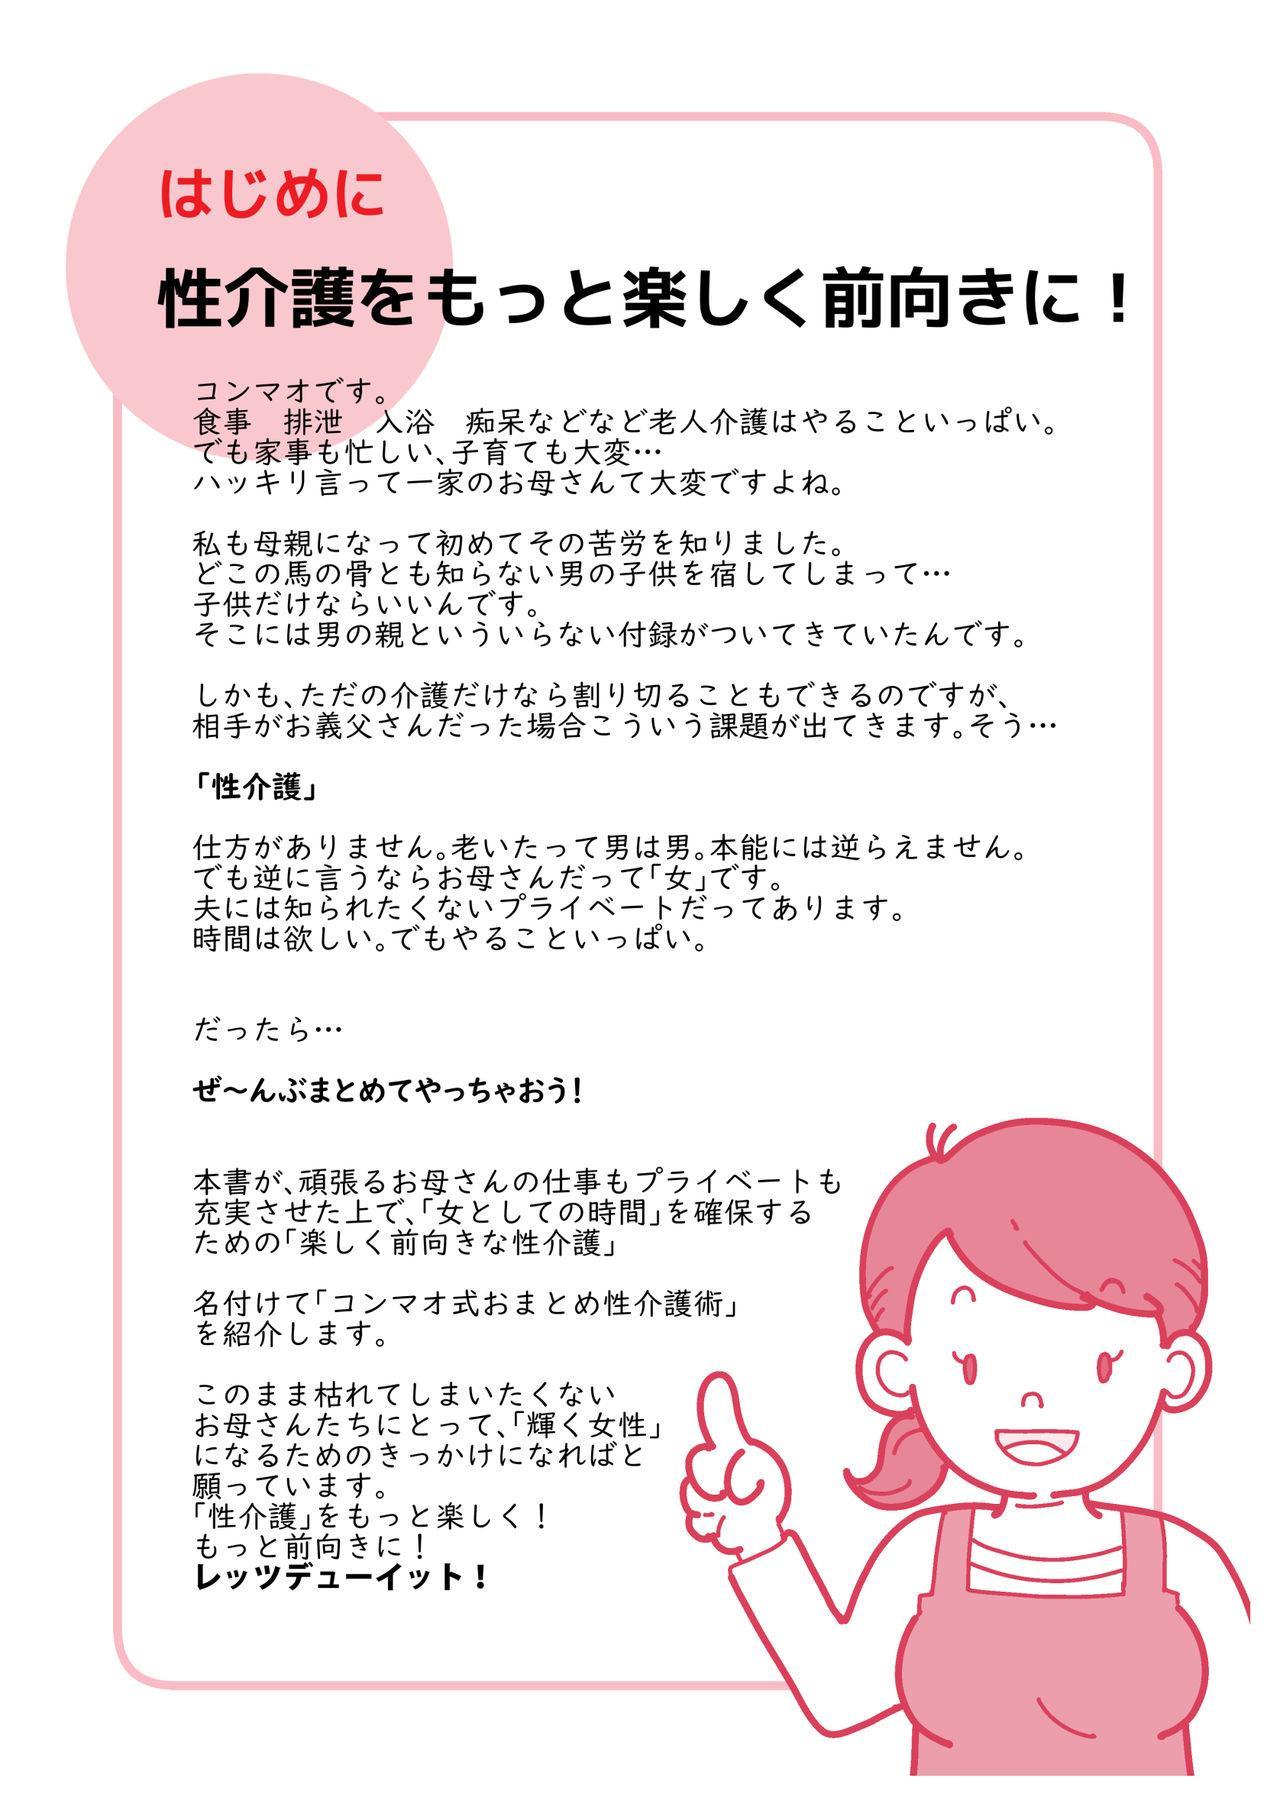 Isogasii Okaasan No Tamuno Sasa Rouzin Seikaigo | Guide for Elderly Sex Health Care to Busy Mom 3